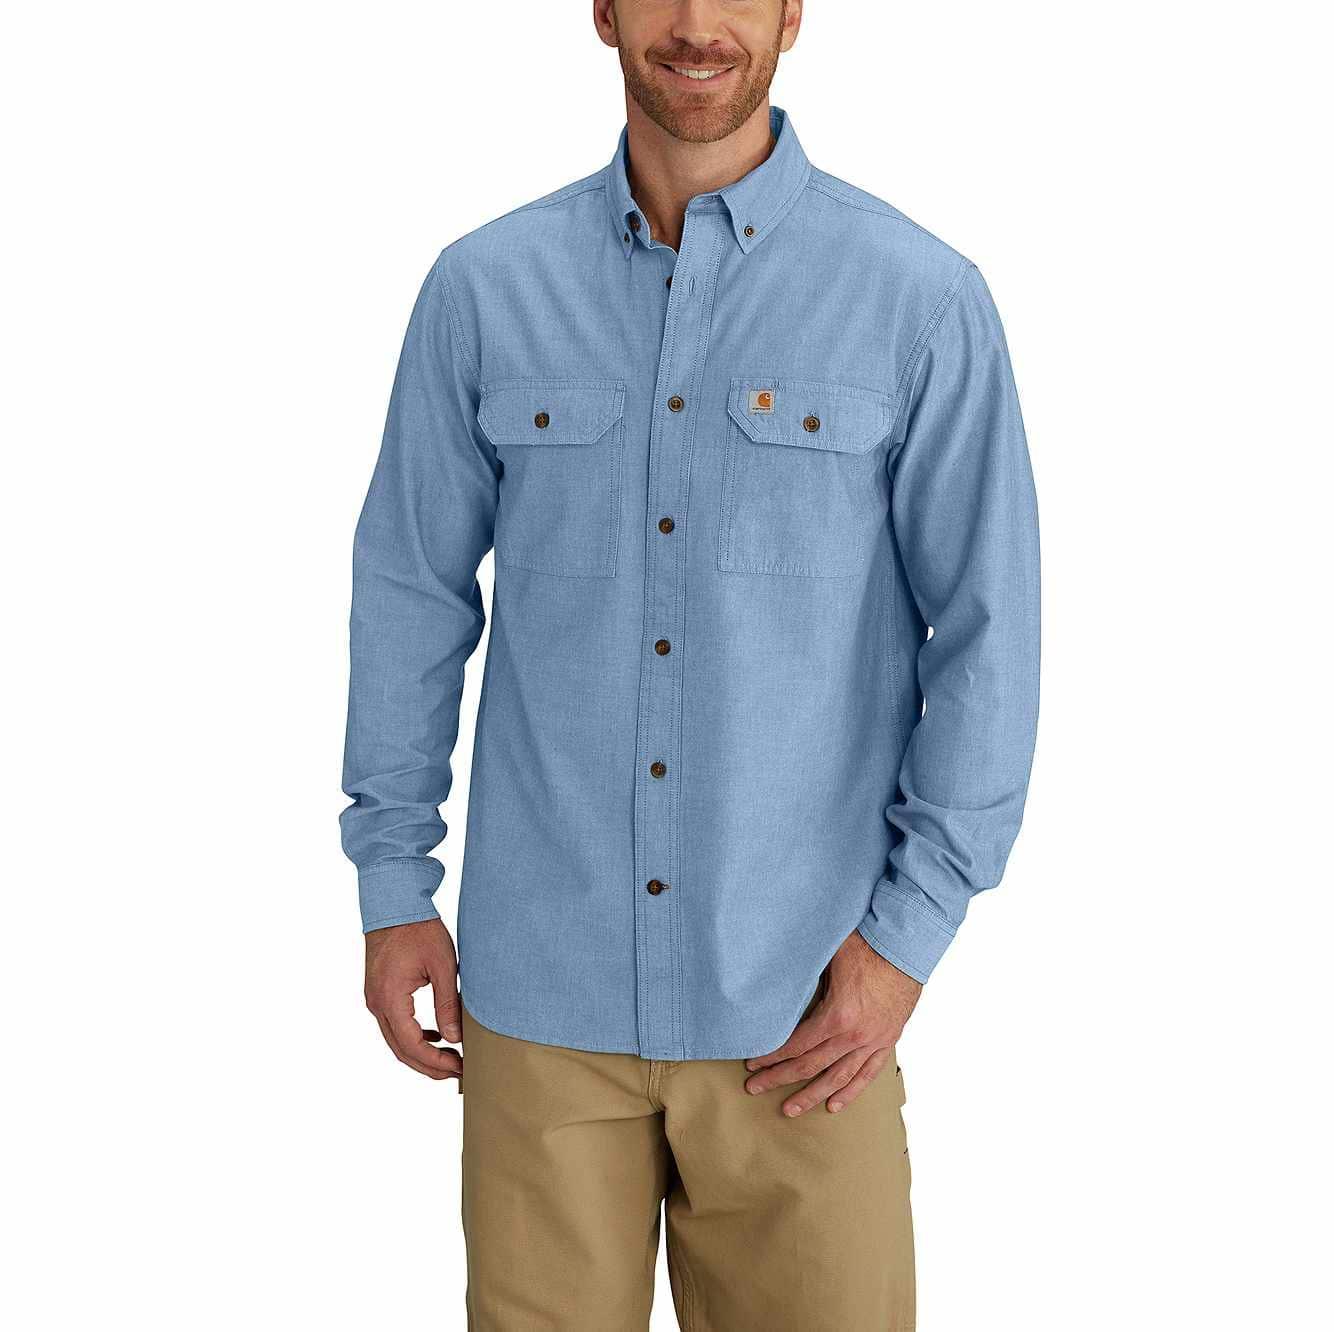 4f214385e2e Men s Fort Long Sleeve Chambray Shirt S202